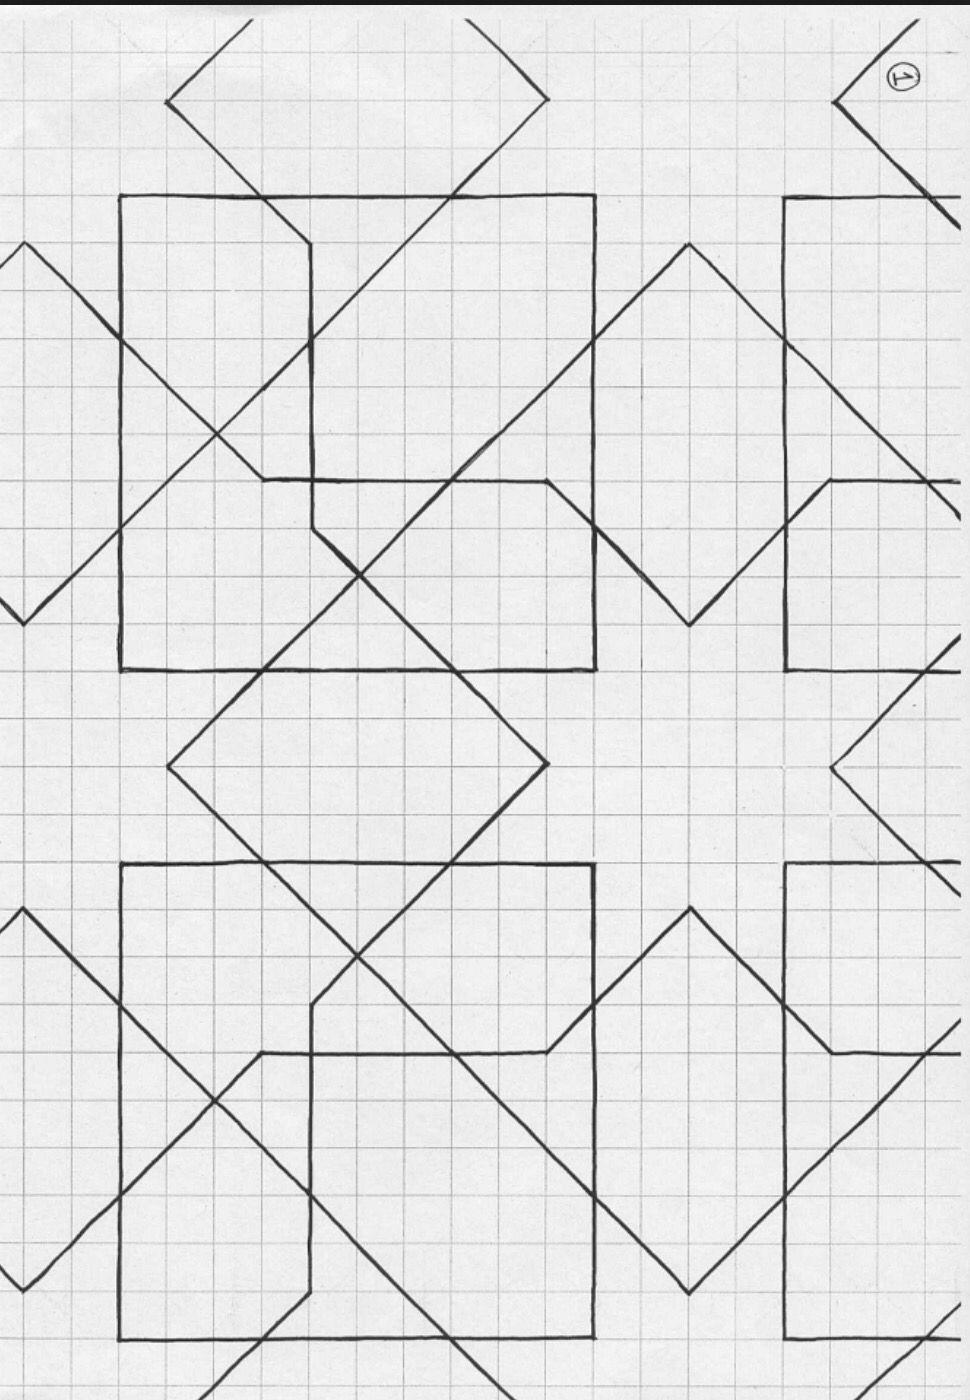 Islamic Tile Design Geometric Drawing Islamic Patterns Geometric Design Art